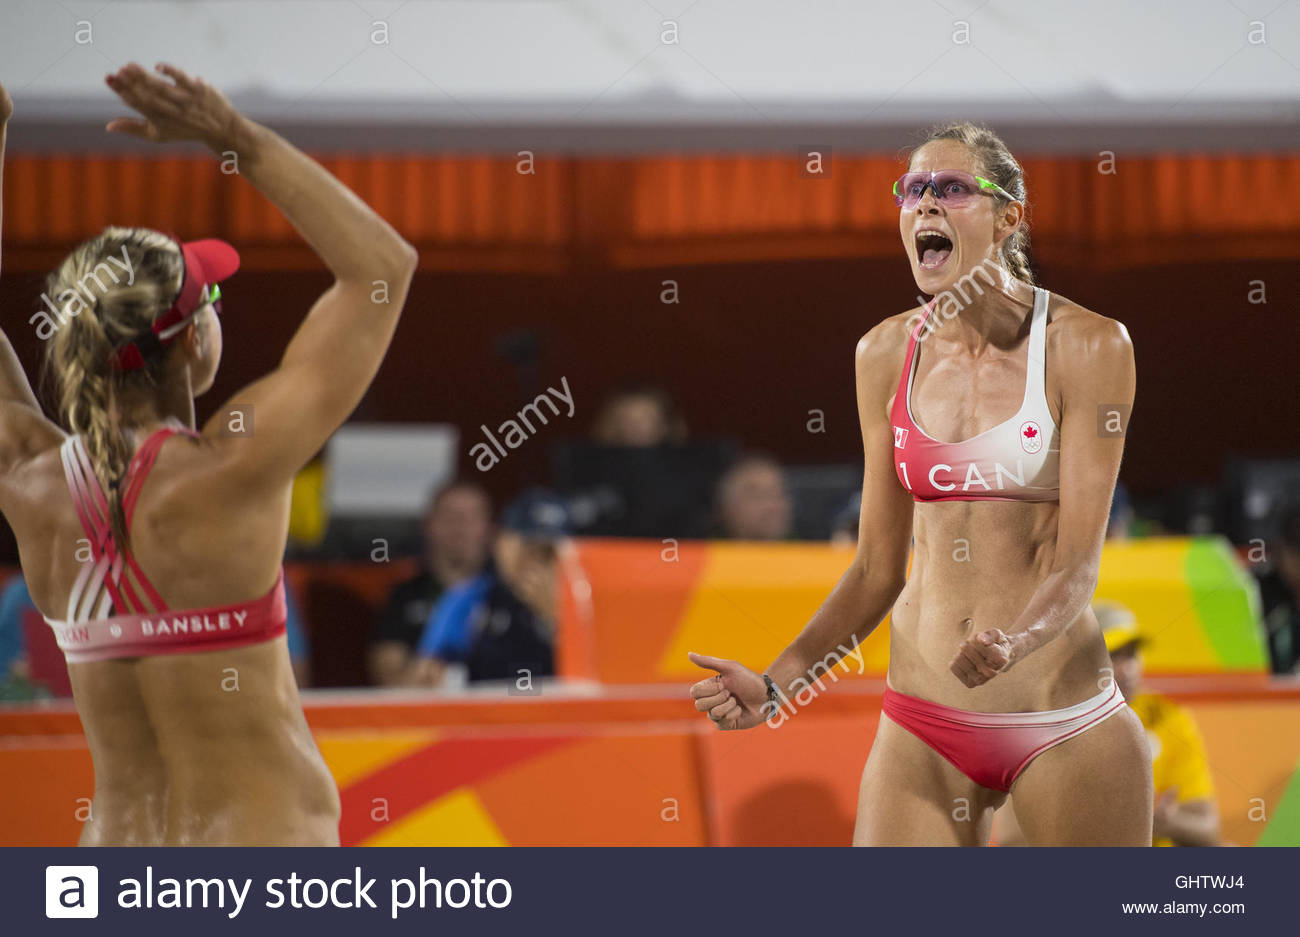 Opinion Bikini brazil contest de janeiro rio opinion